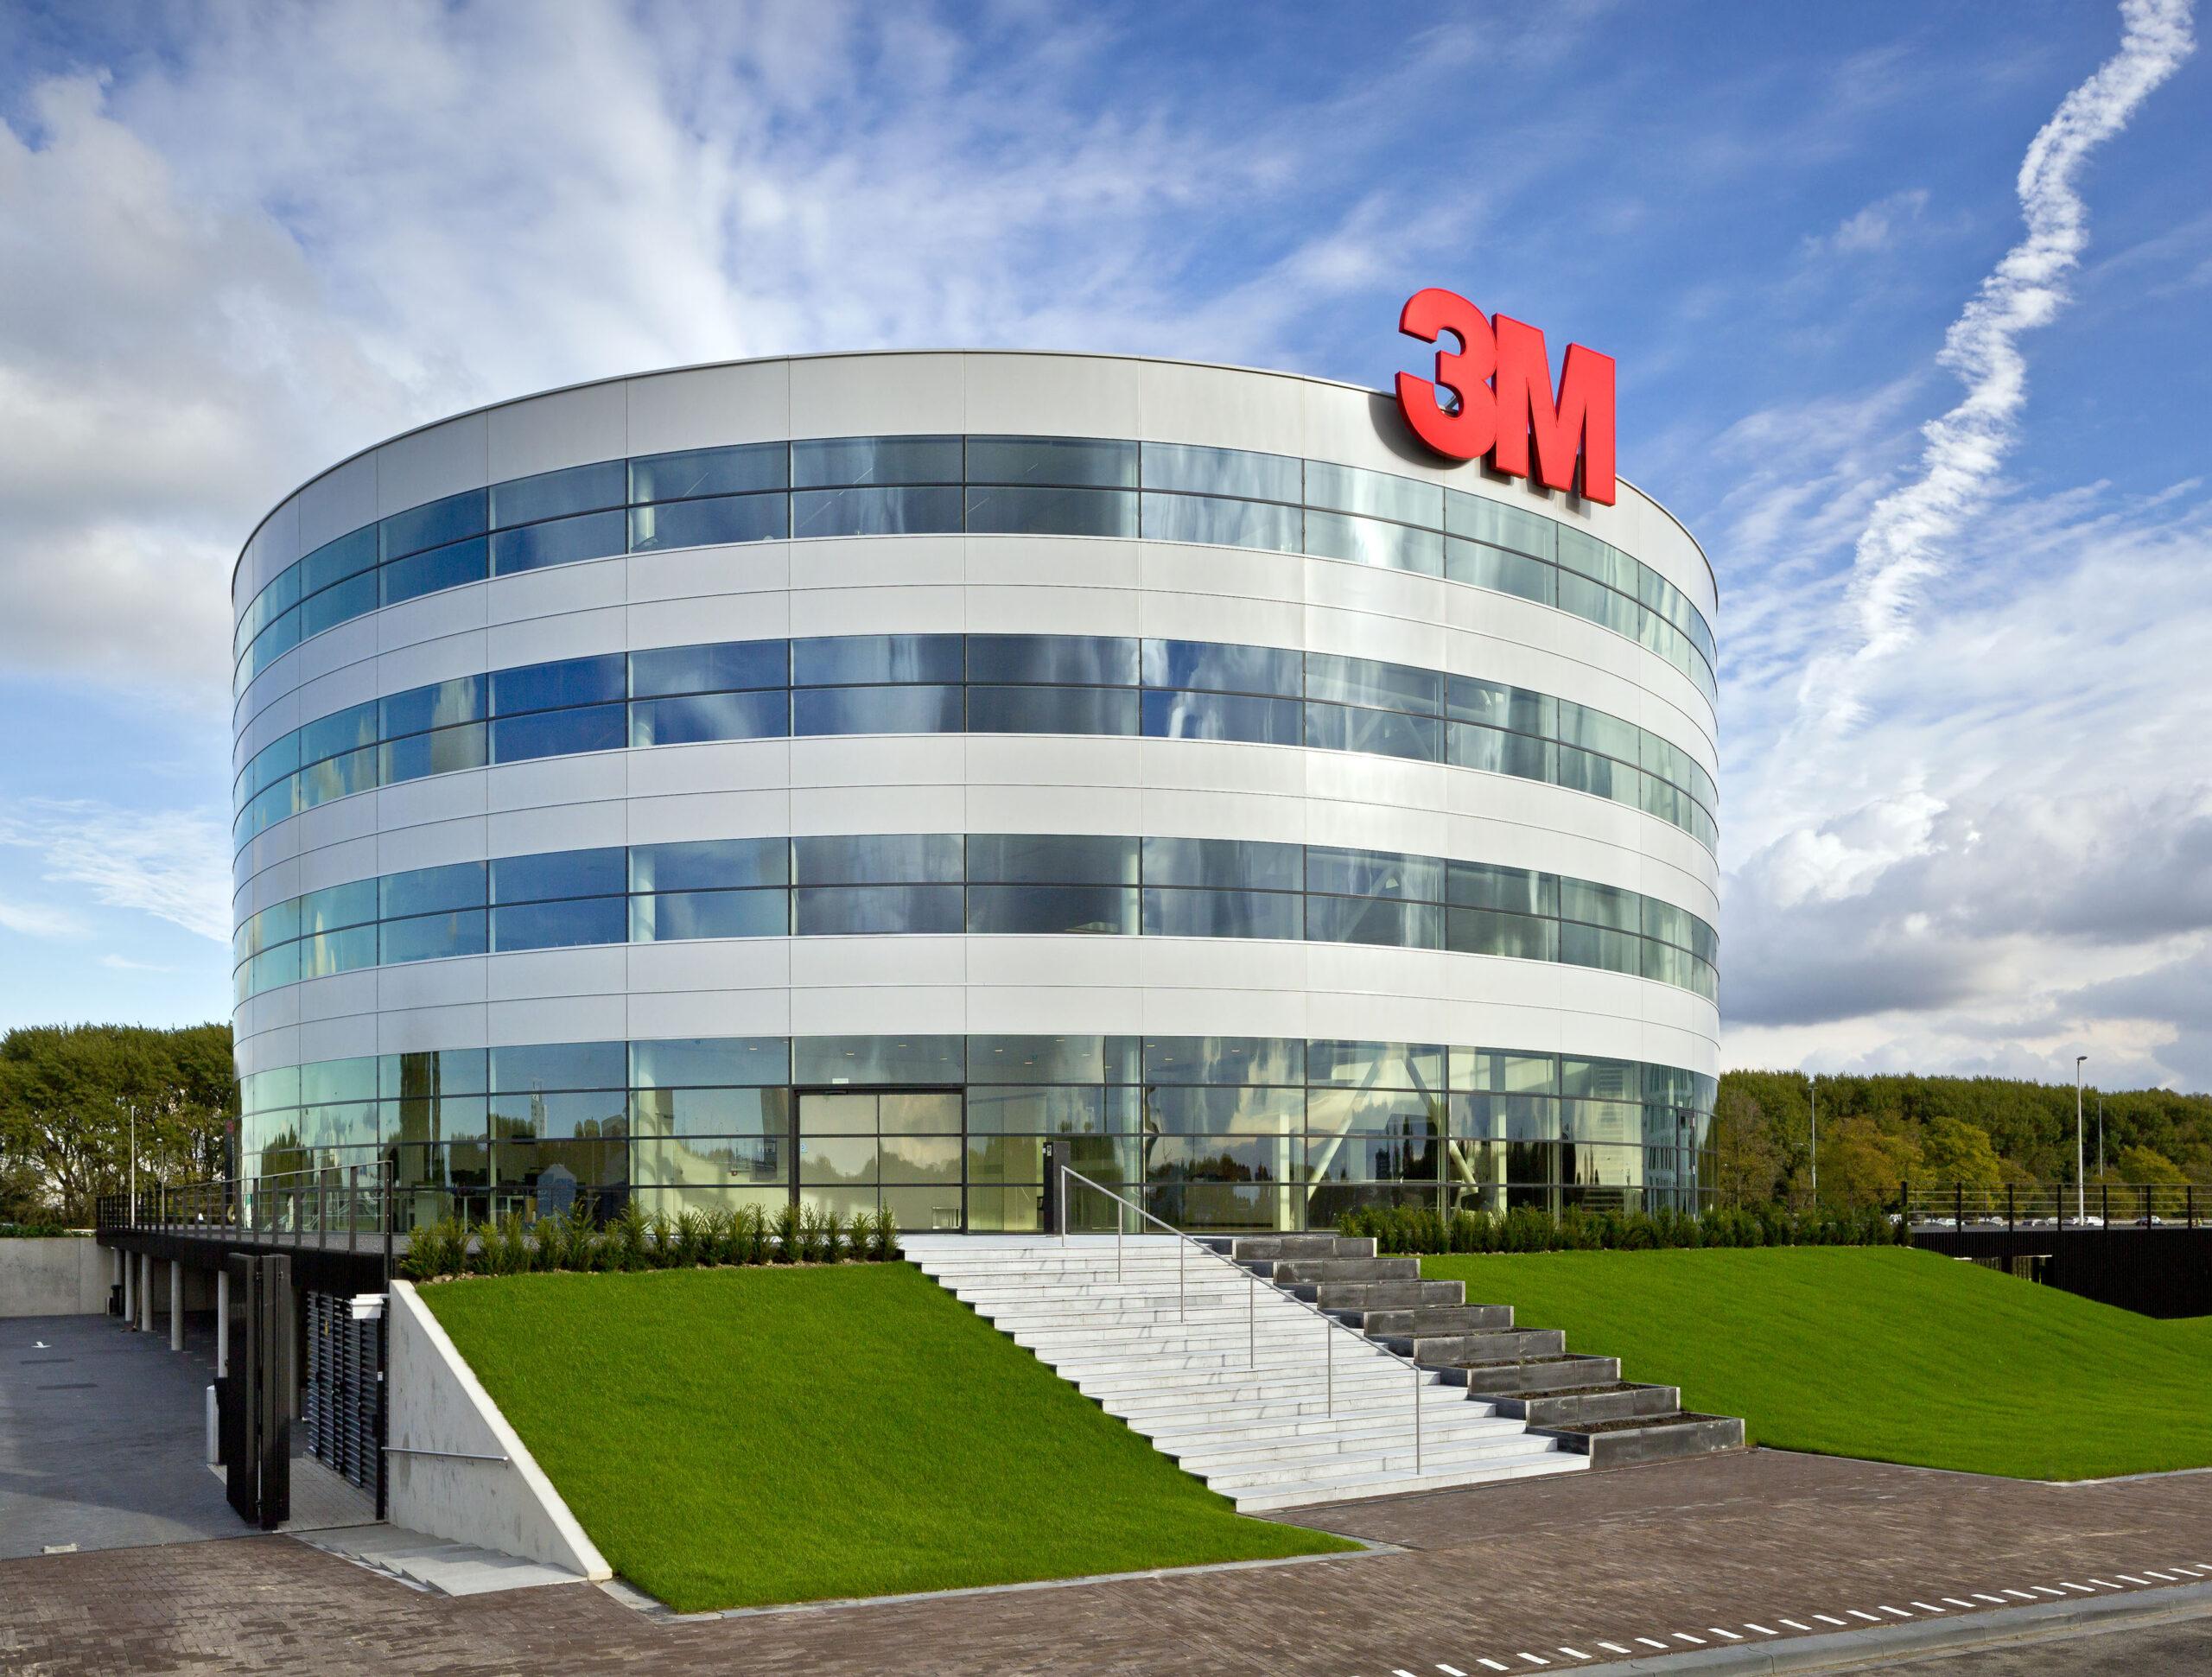 3M verhuist naar sciencepark Technopolis